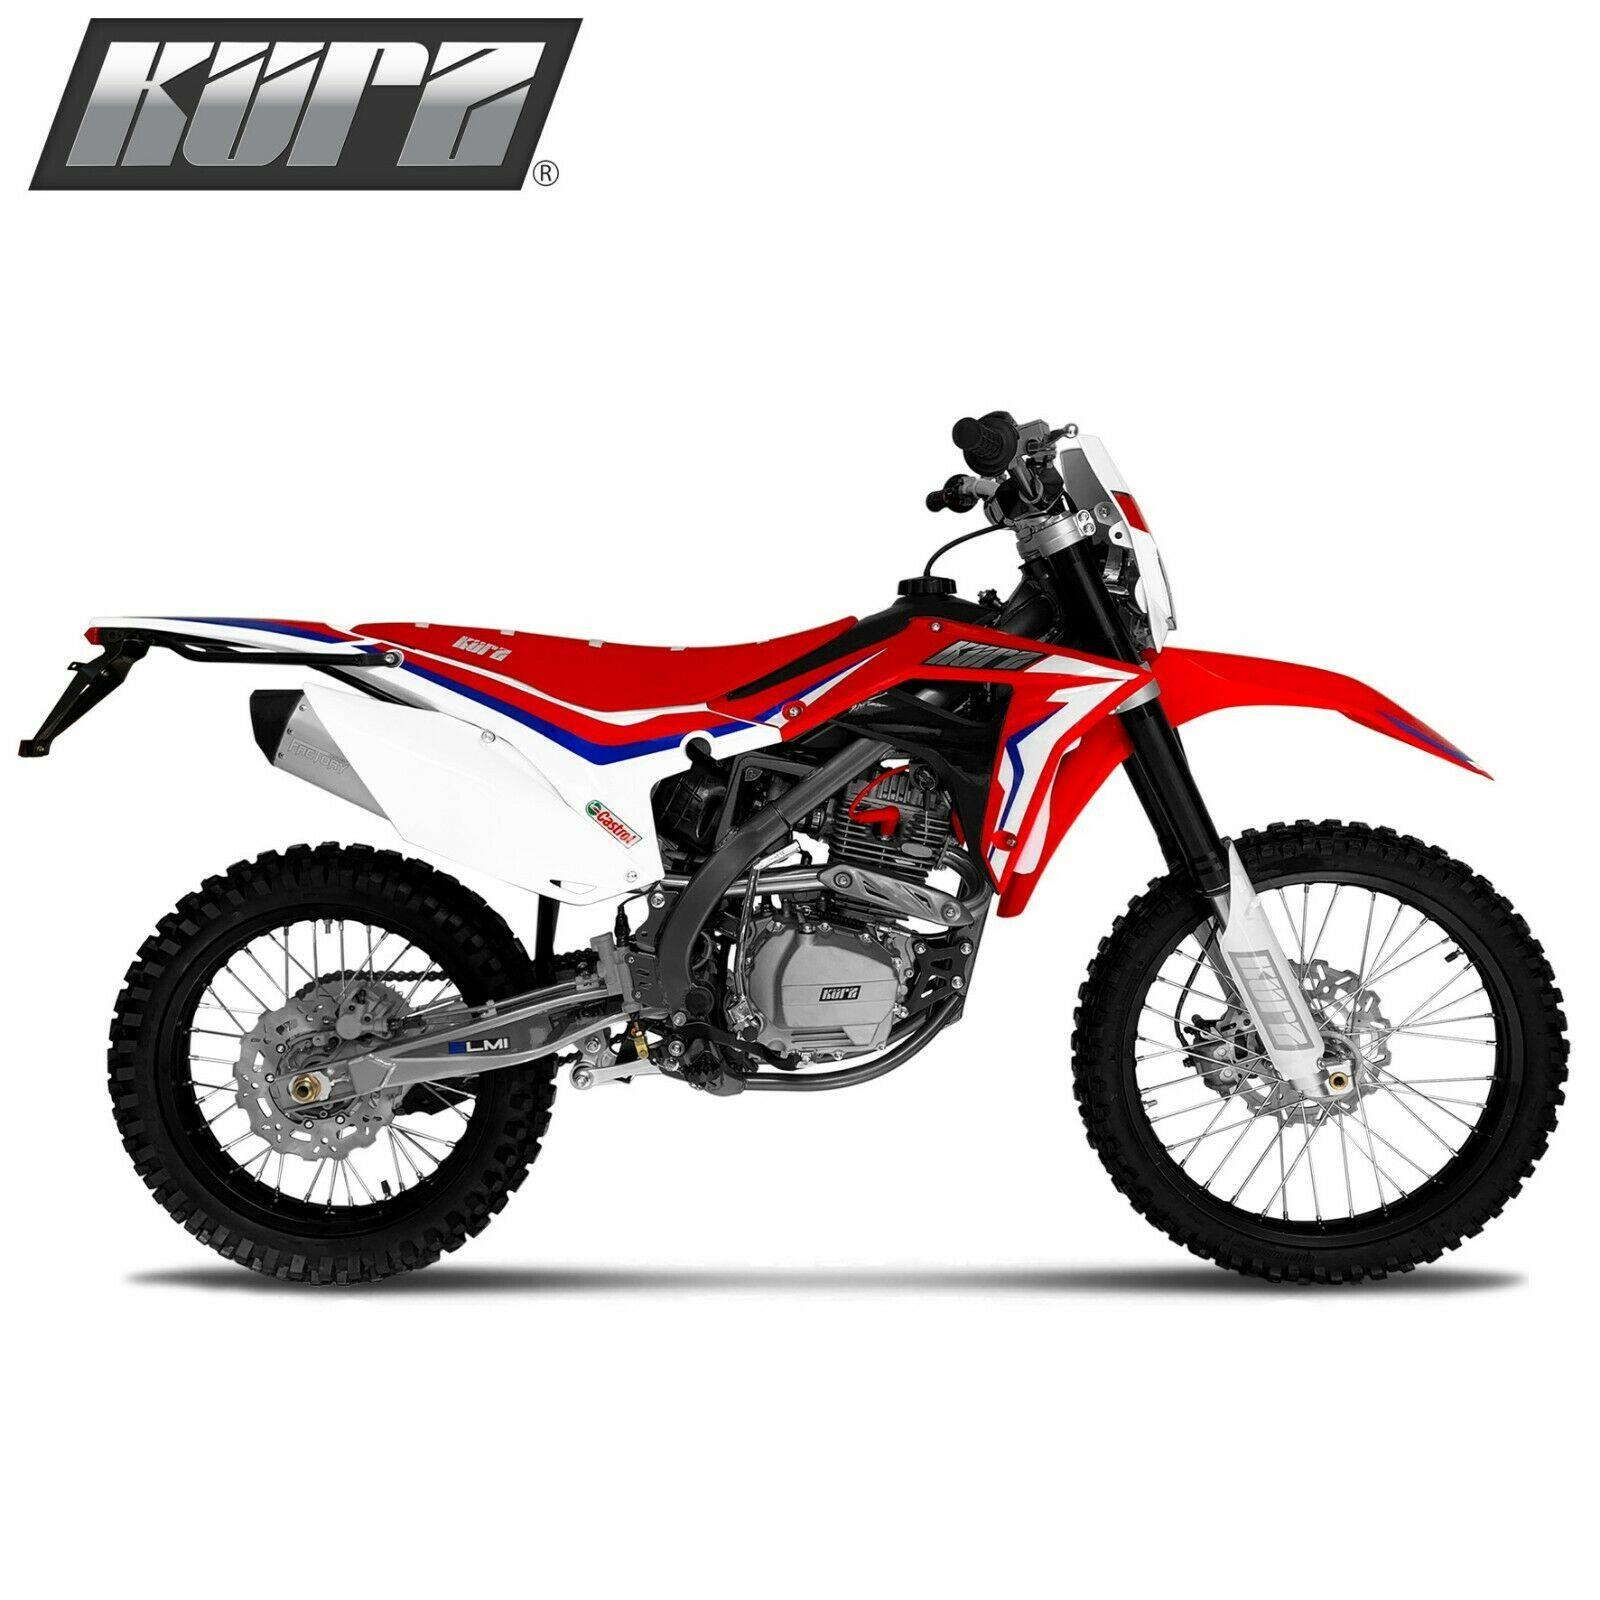 Genuine Kurz Fs 250 Enduro Off Road Legal Bike Motorcycle